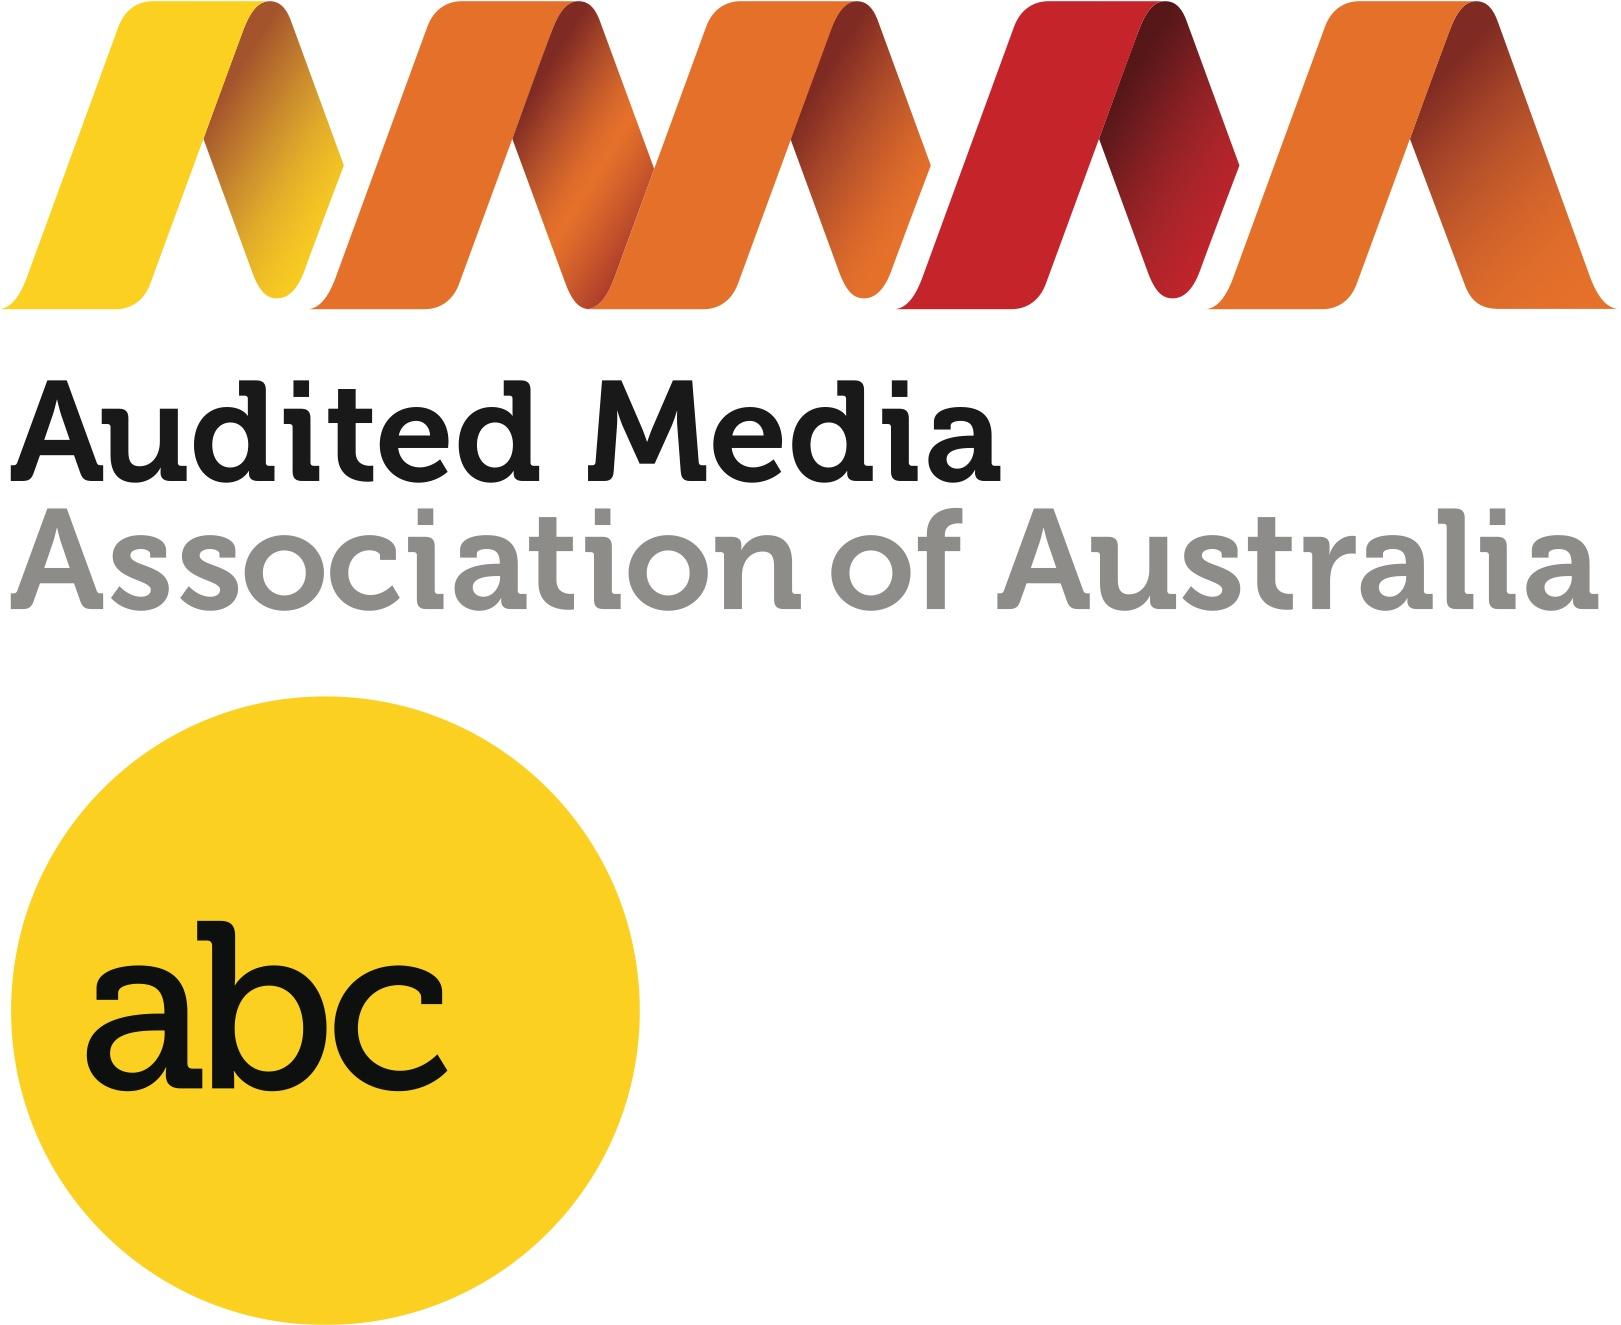 ABC badge